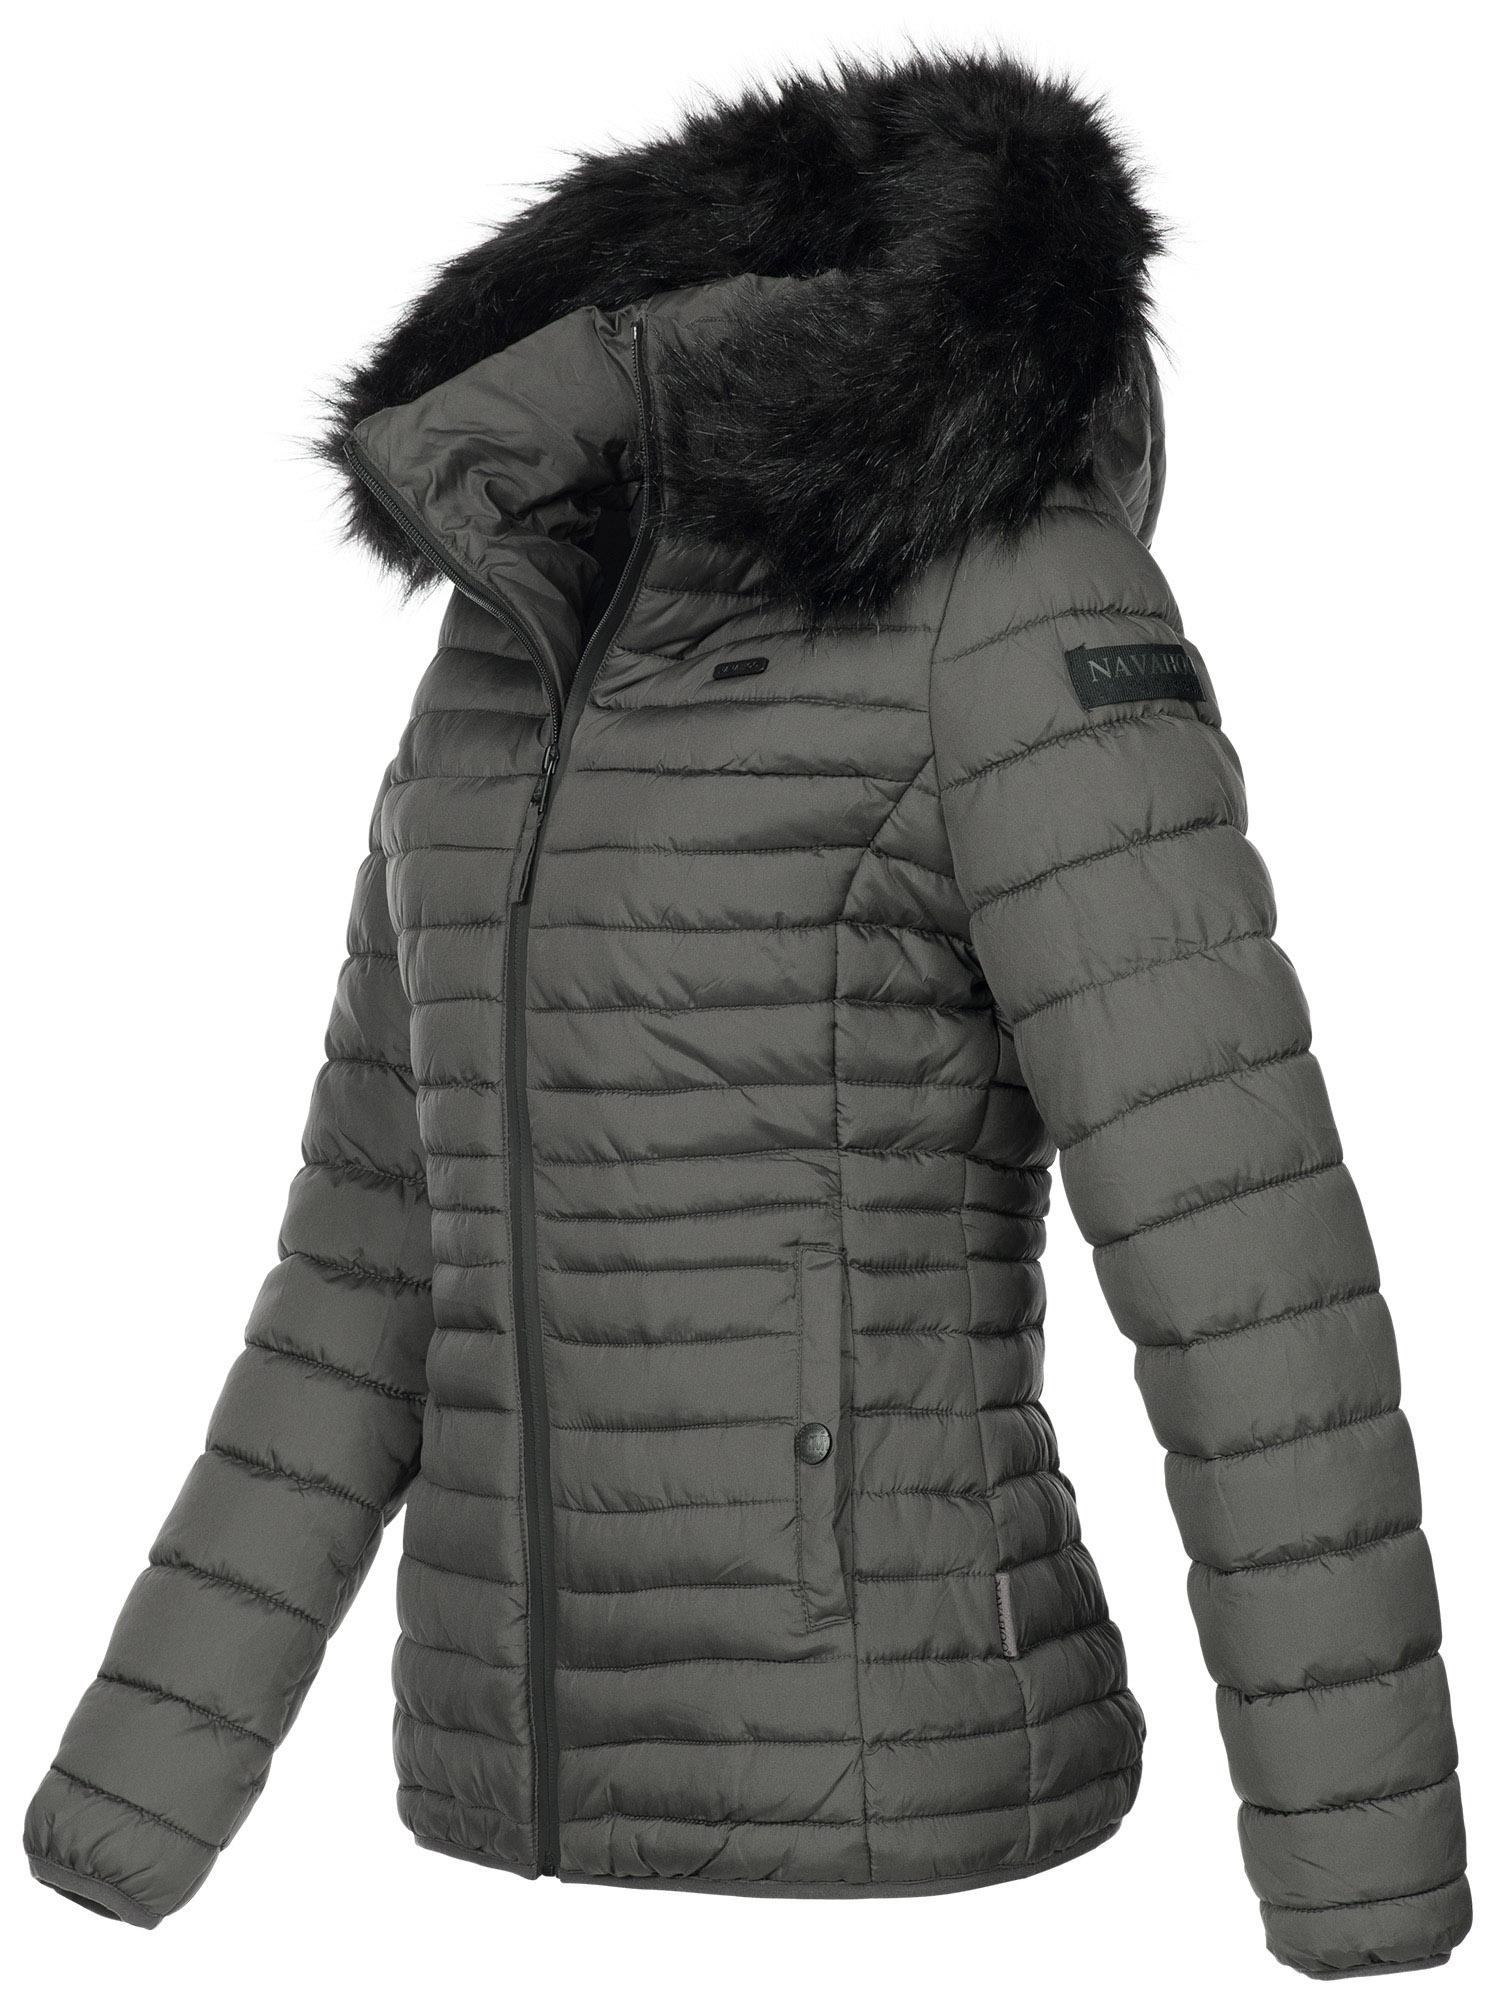 afb41087d8be9c Navahoo Designer Damen Winter Jacke Steppjacke Stepp Winterjacke NEU ...